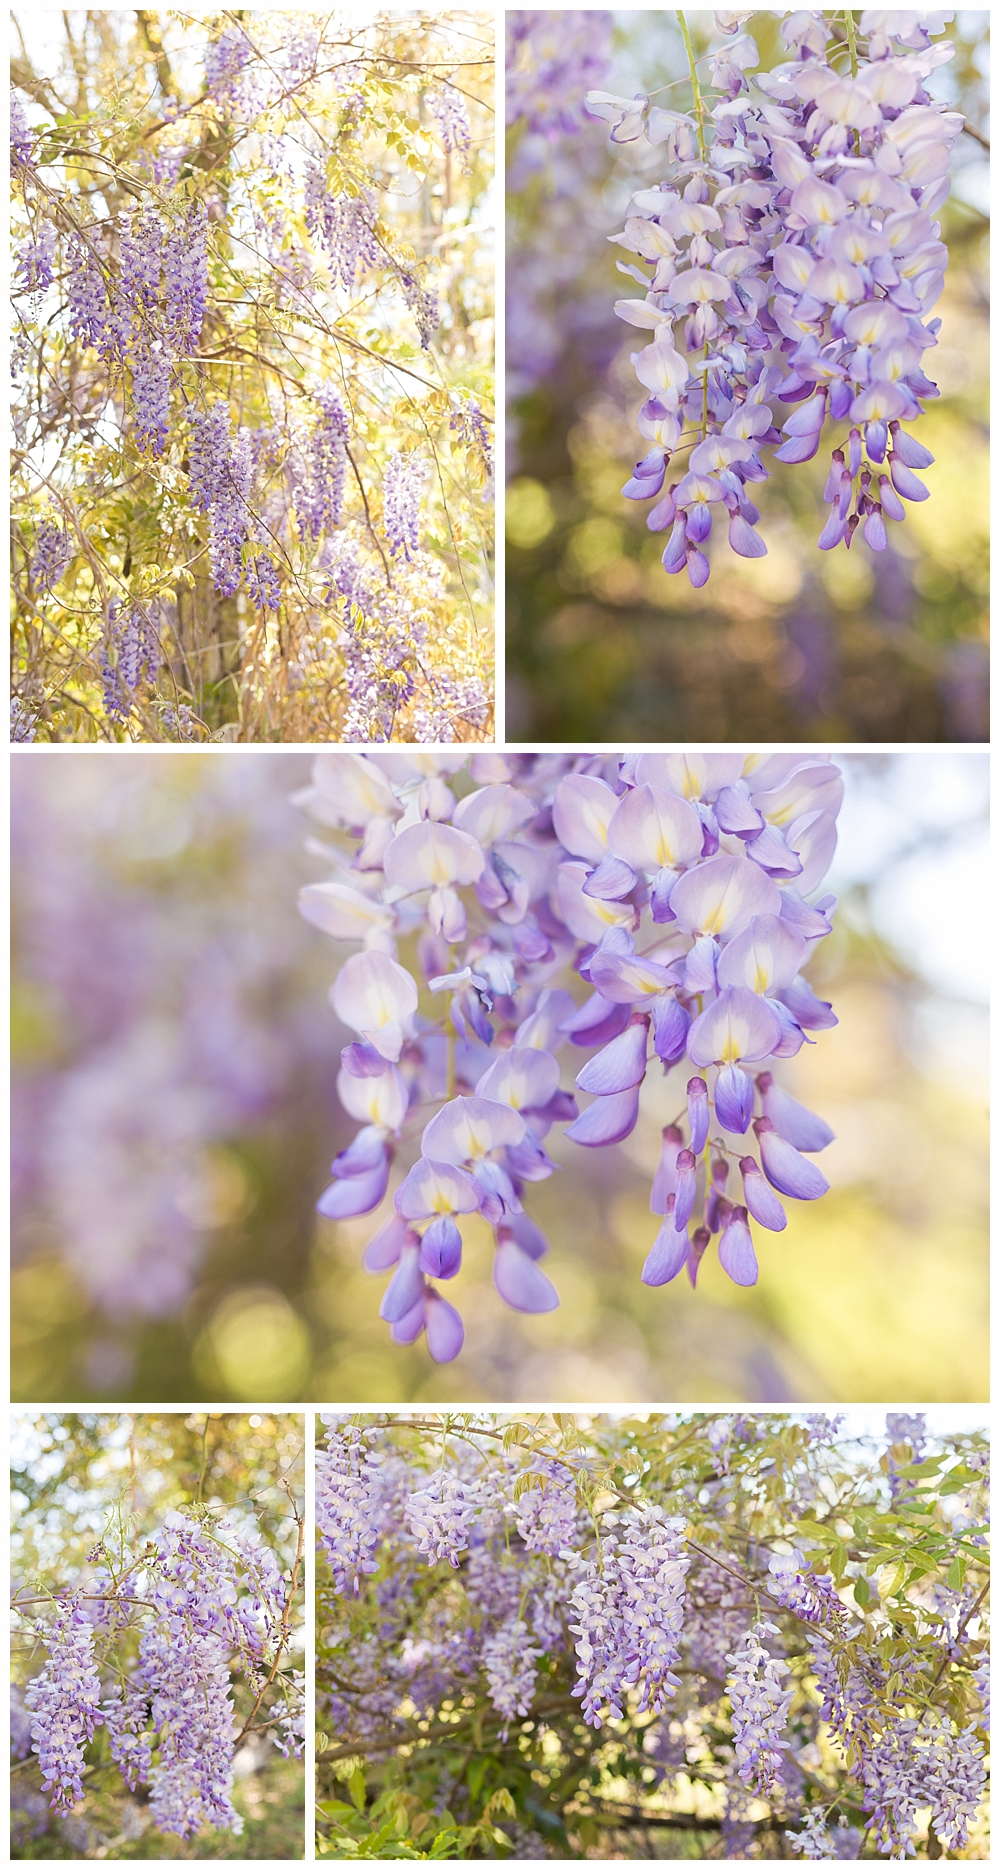 beautiful wisteria photos taken on the Mississippi Gulf Coast